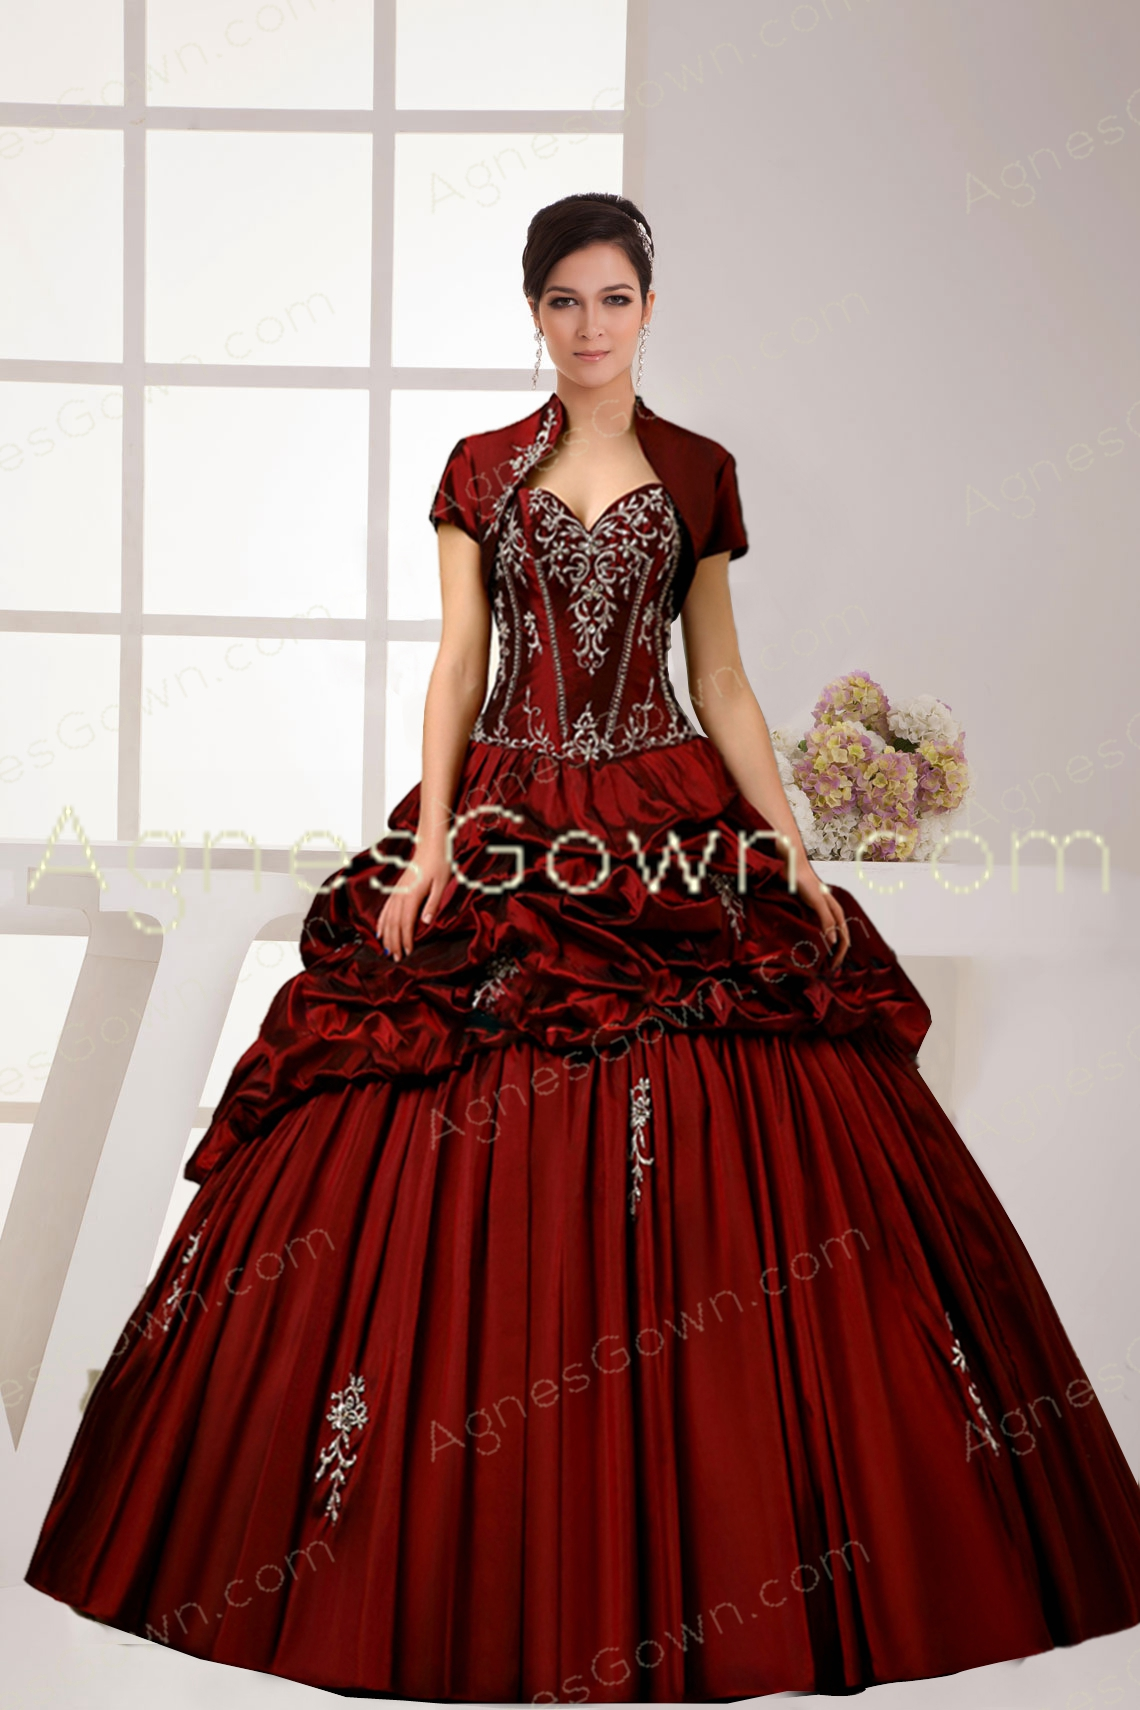 Classy Burgundy Quinceanera Dress With Bolero